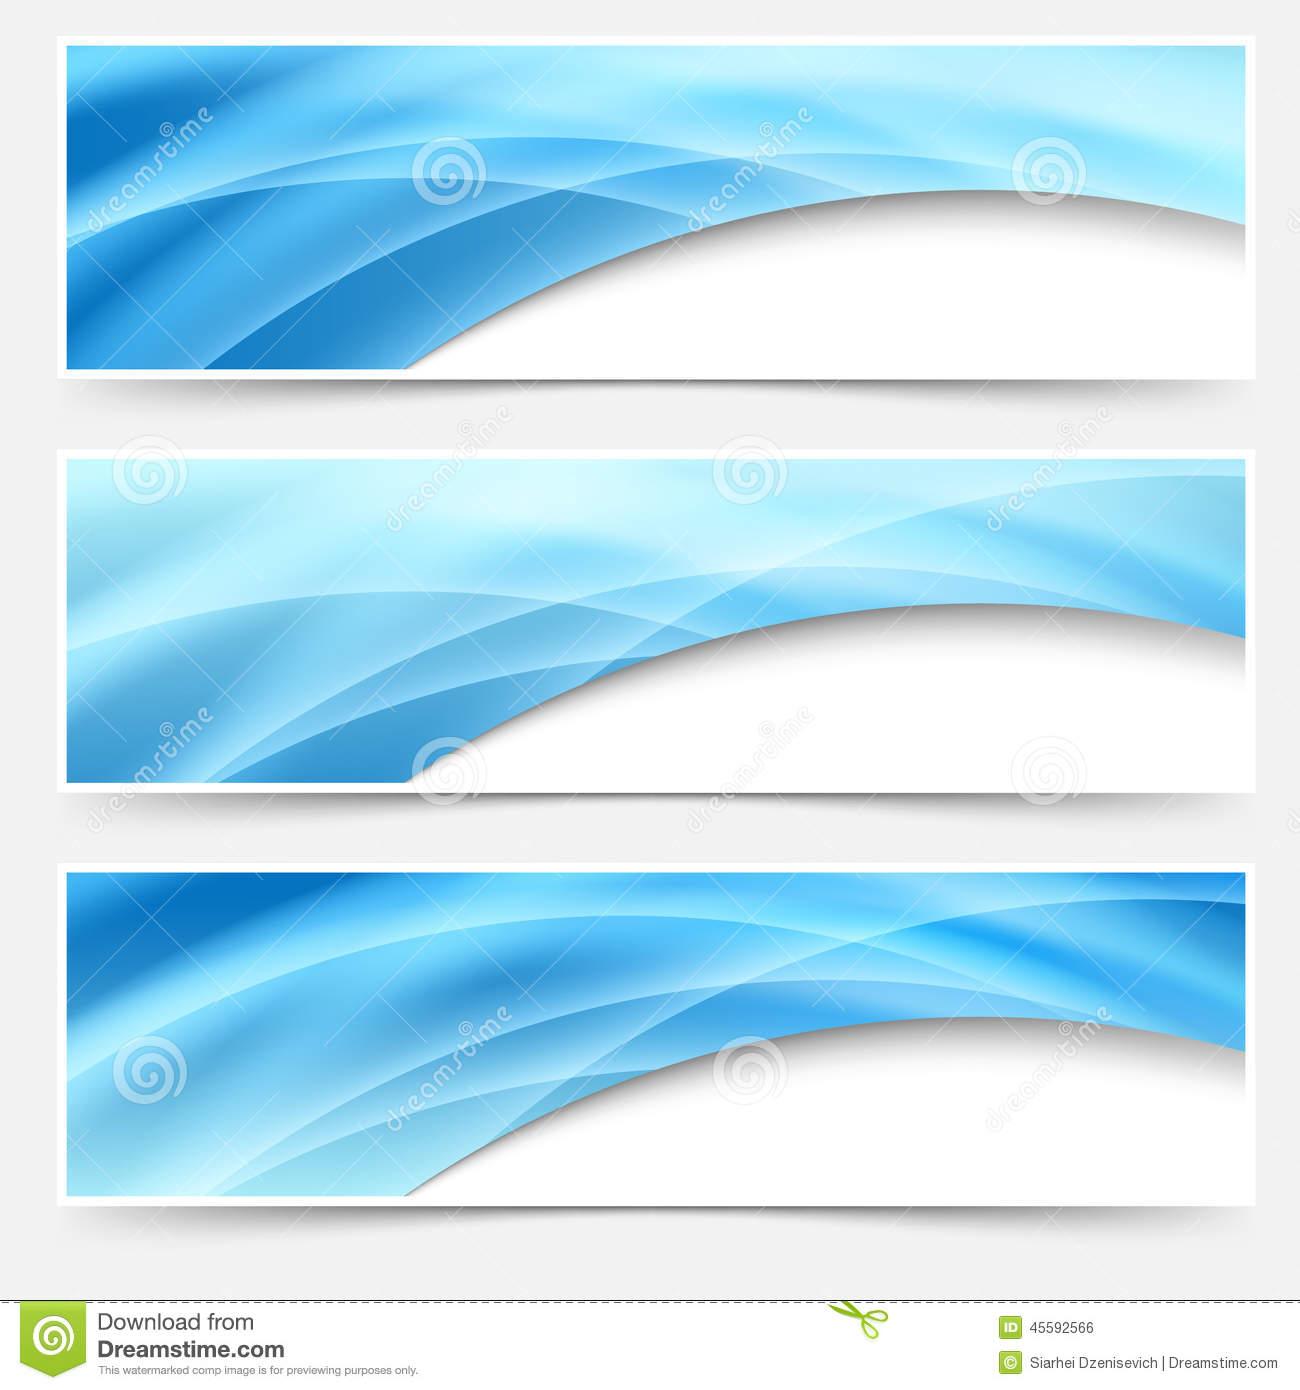 13 vector header border images